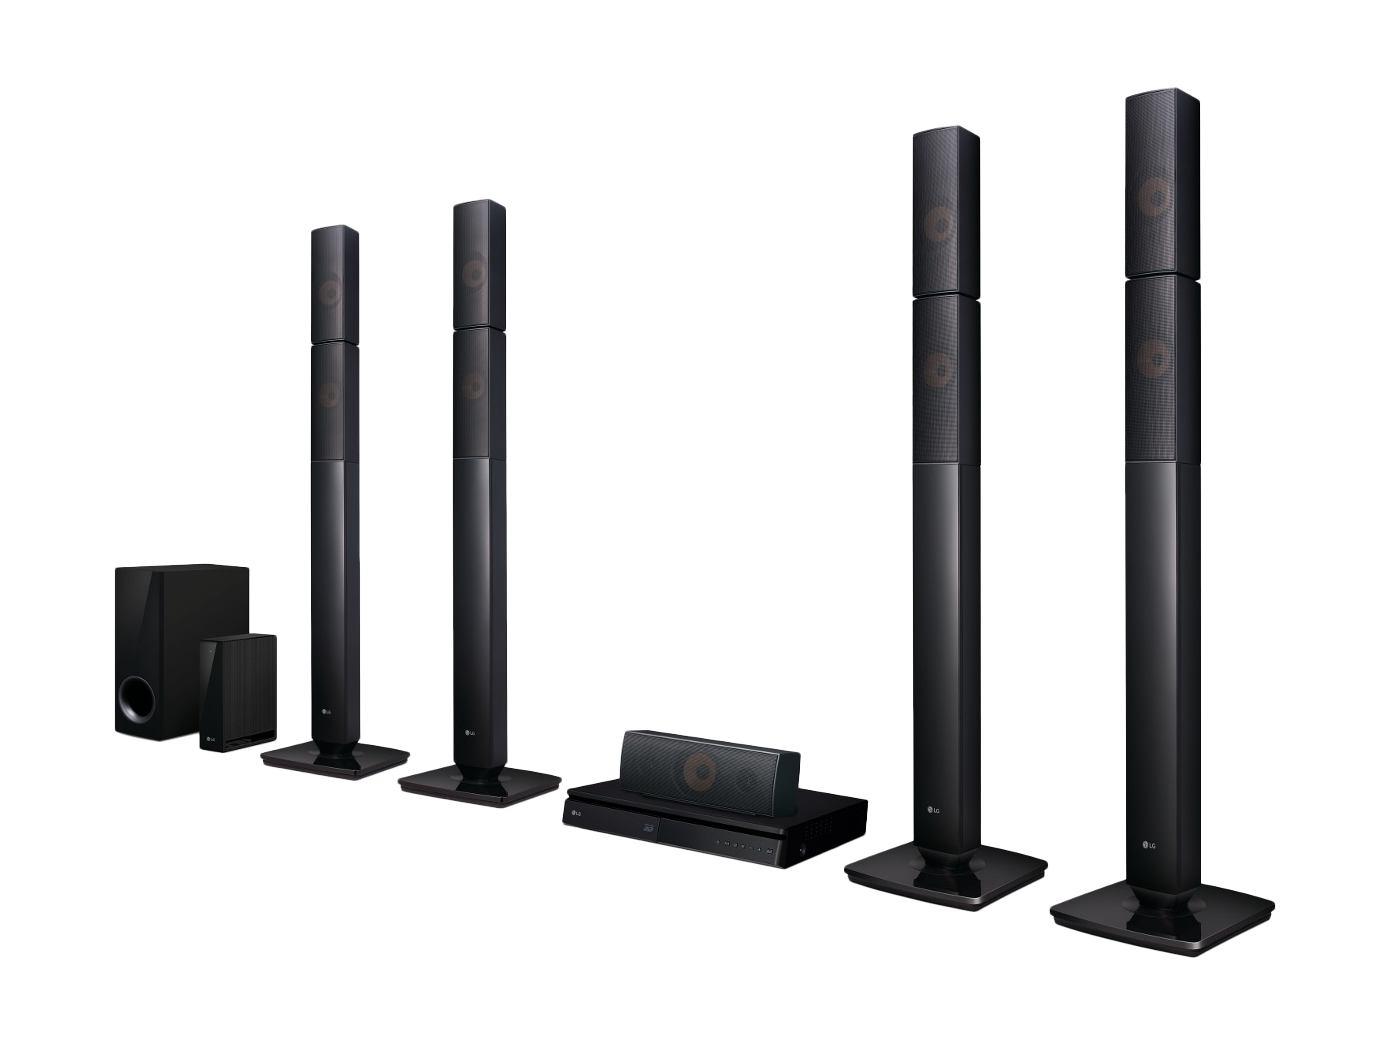 LG LHB655NW - LG LHB655NW home cinema system 3D 5 1 channels 1000 W